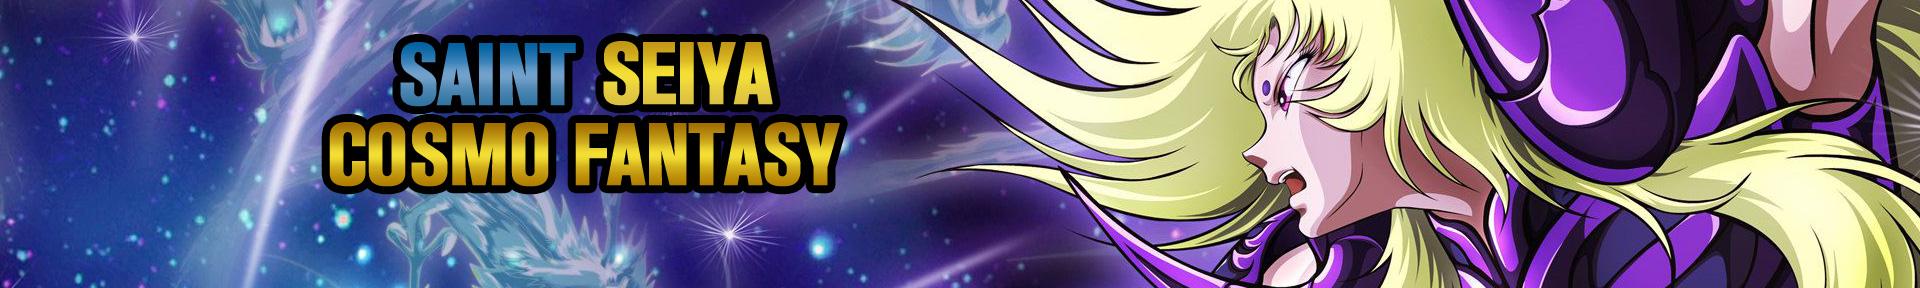 Saint Seiya Cosmo Fantasy Holy Stone